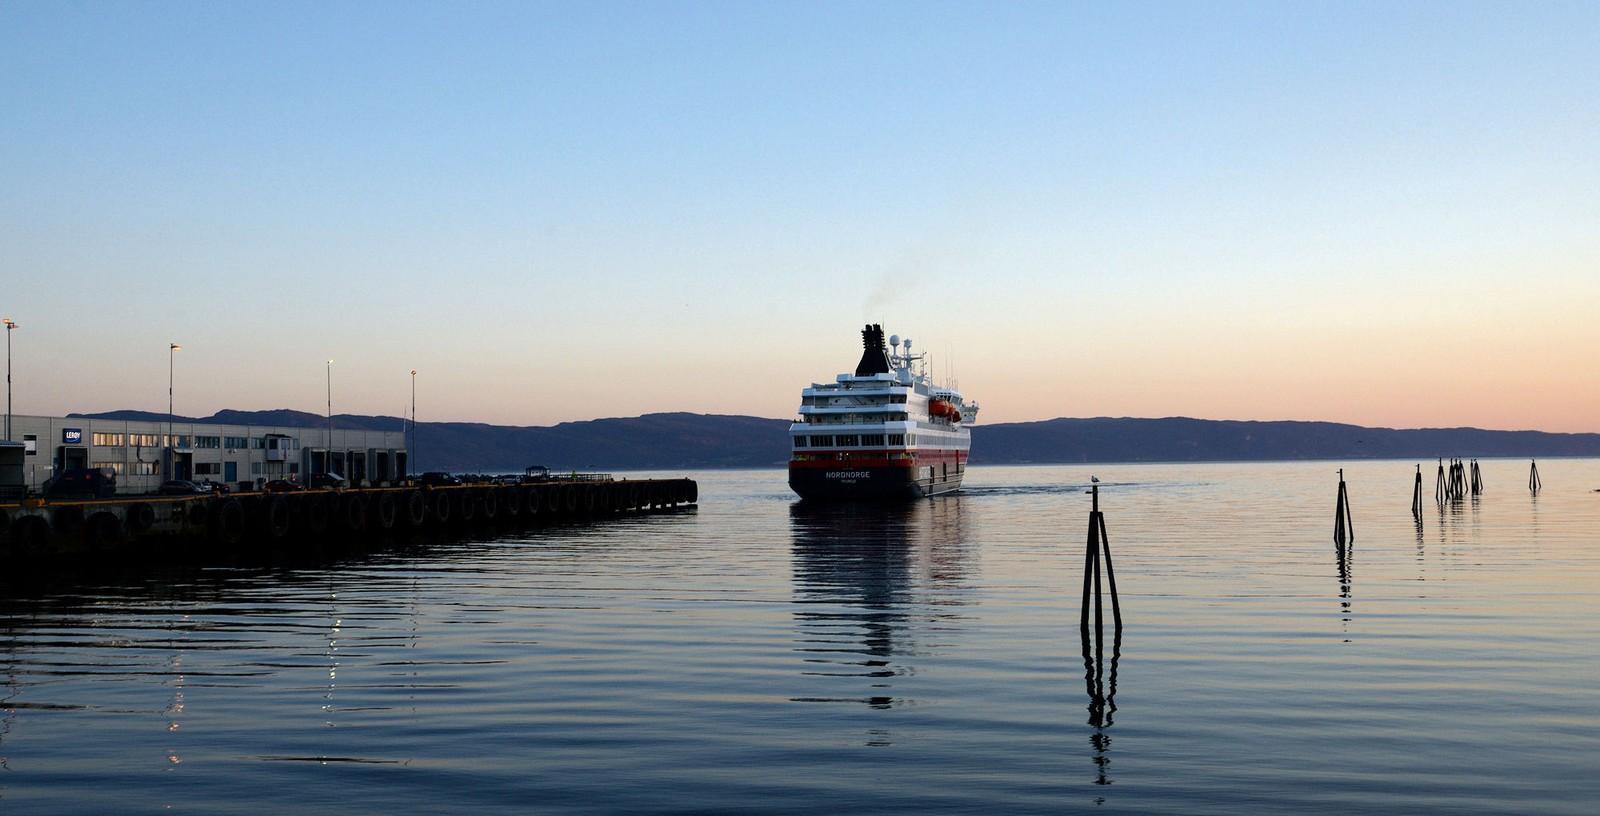 MS Nordnorge på vei inn til kai i Trondheim